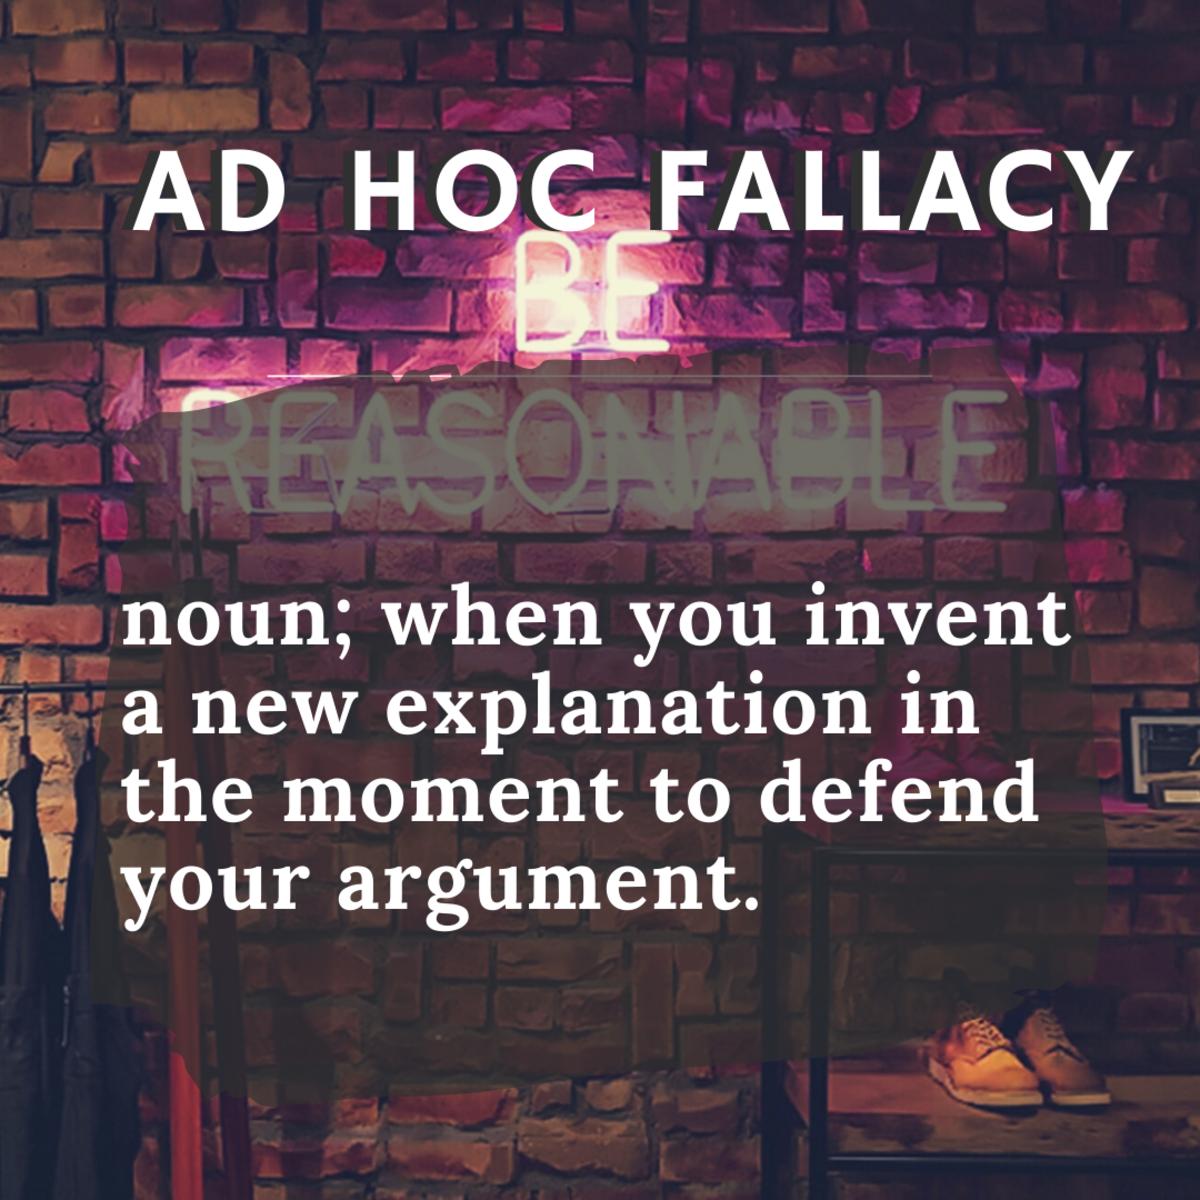 Ad Hoc Fallacy